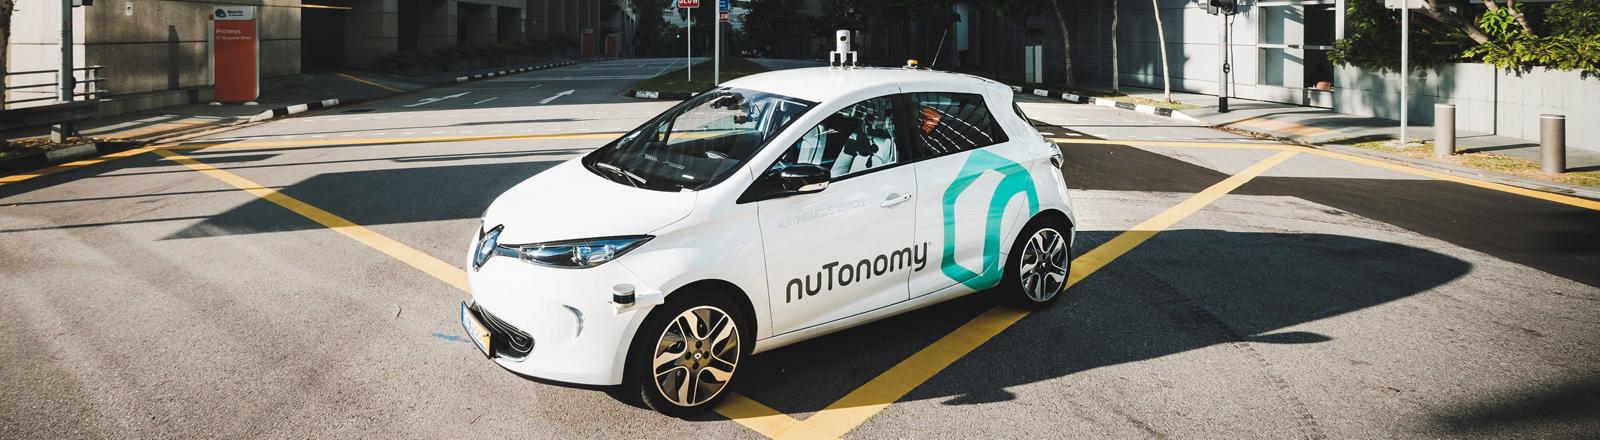 Selbstfahrendes Taxi von Nutonomy